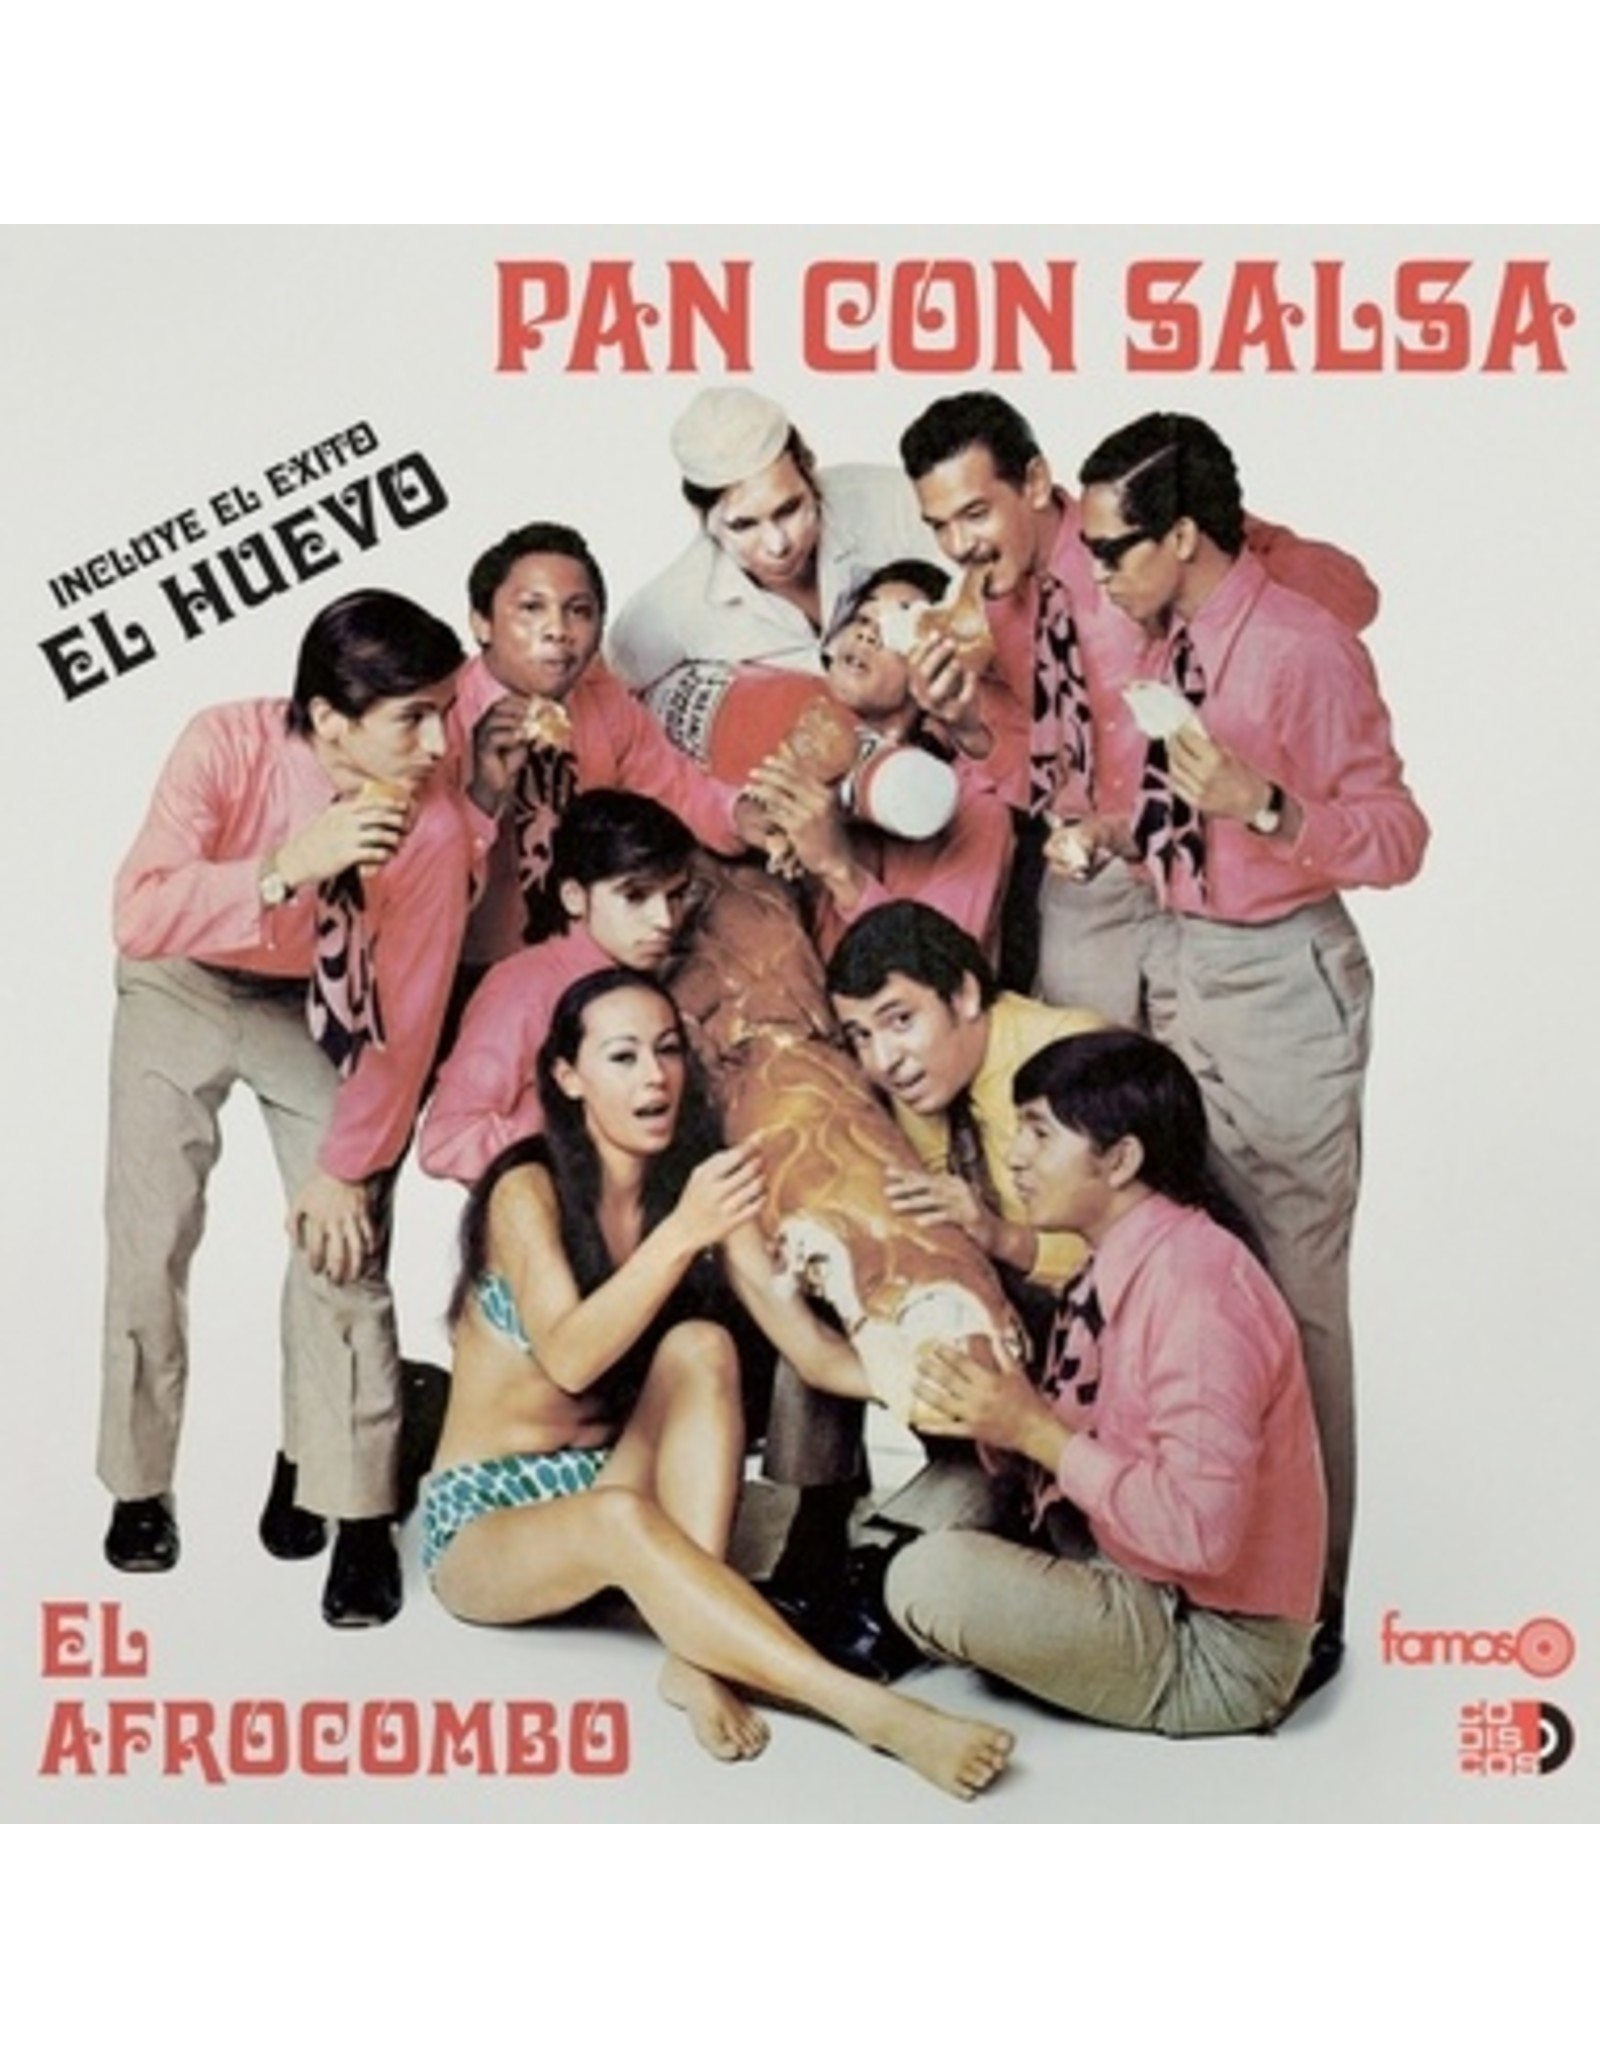 New Vinyl El Afrocombo - Pan Con Salsa LP